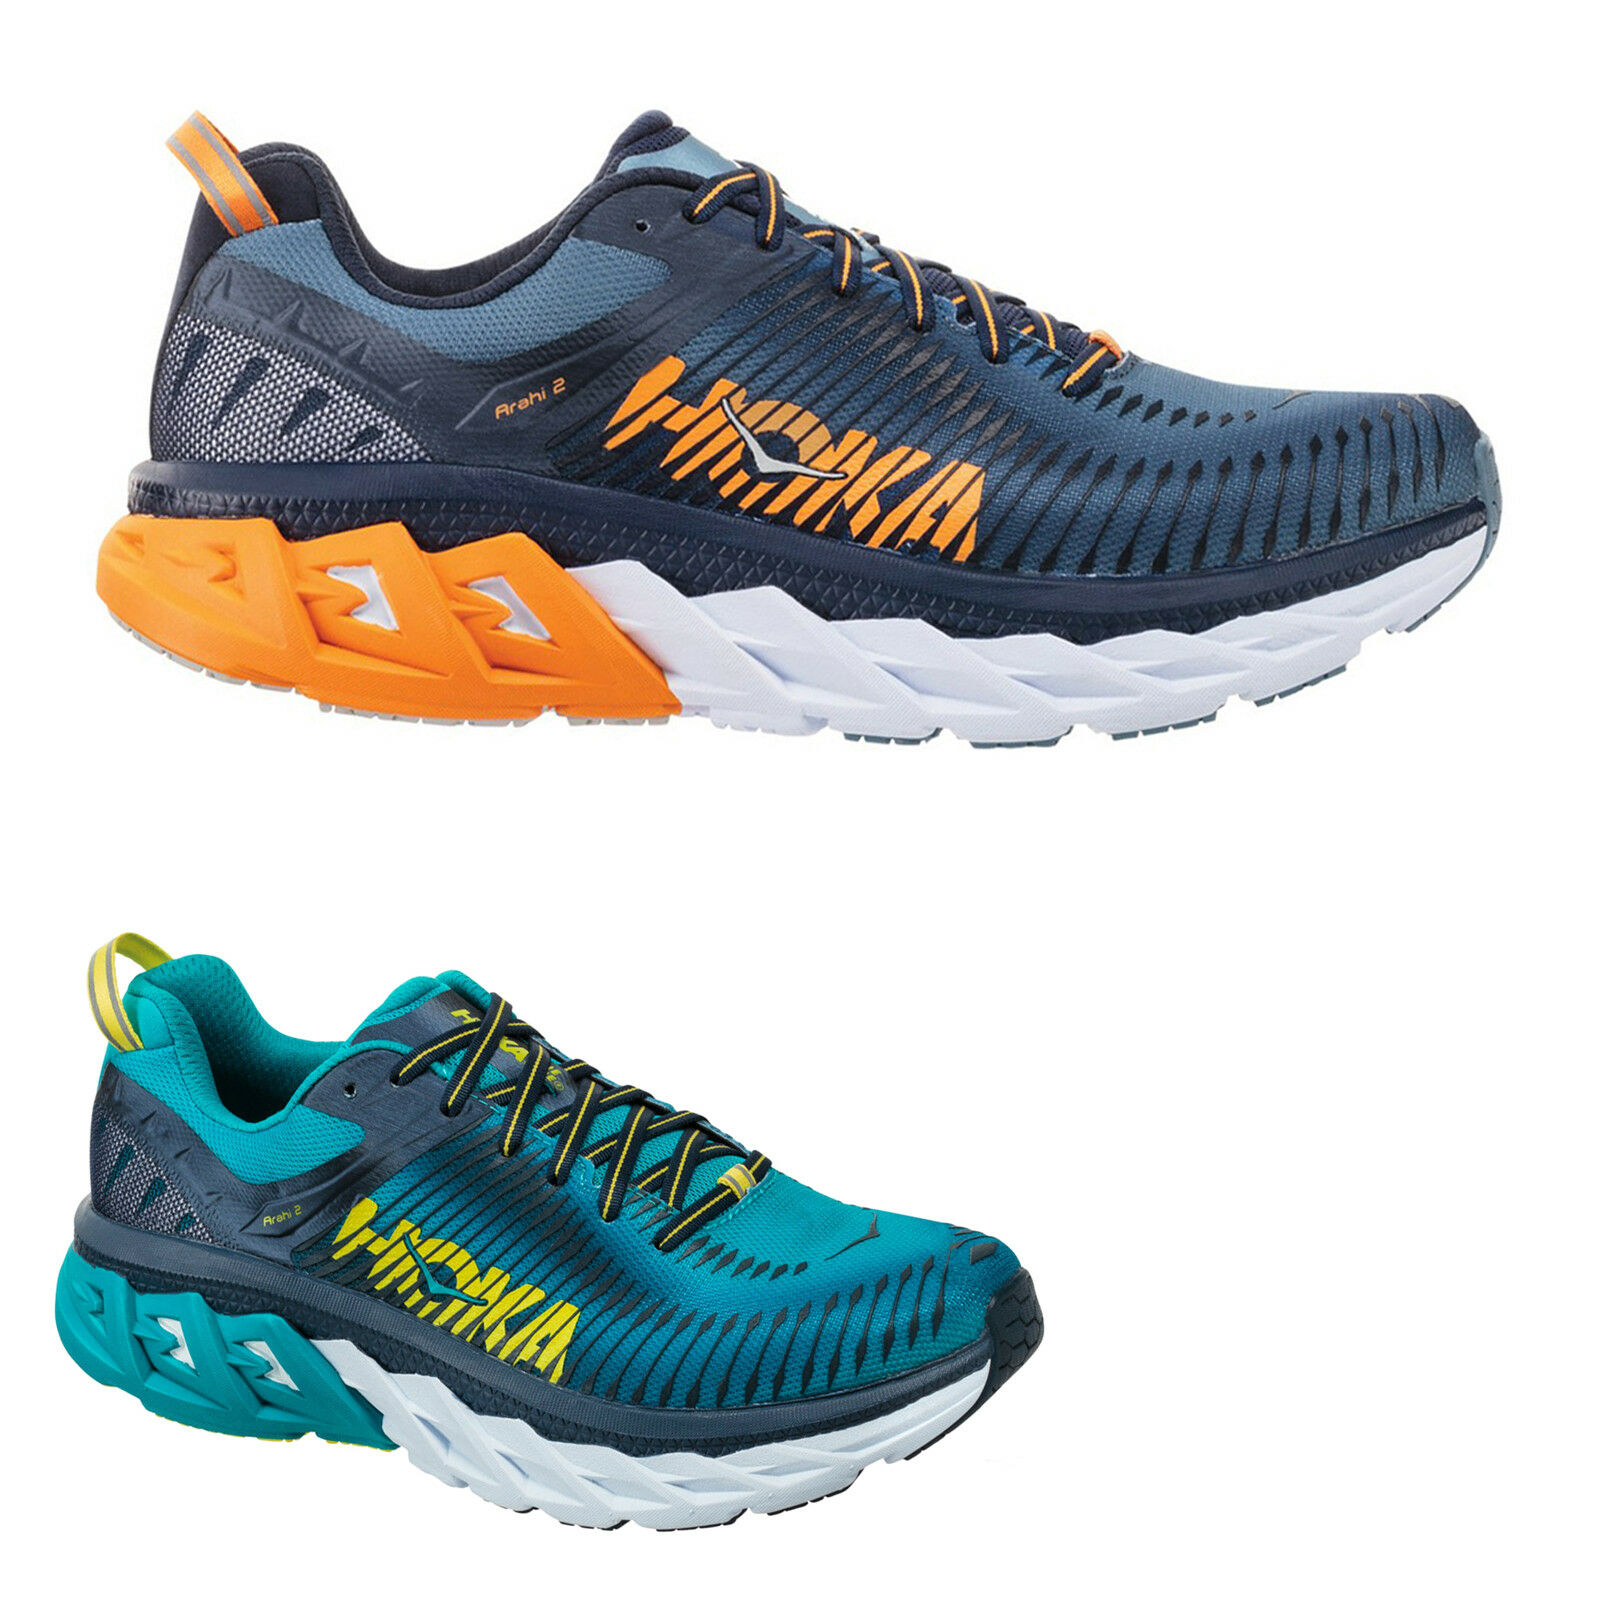 Hoka One Arahi 2 Mesh Low -Top Running Mens Trainers   a prezzi accessibili